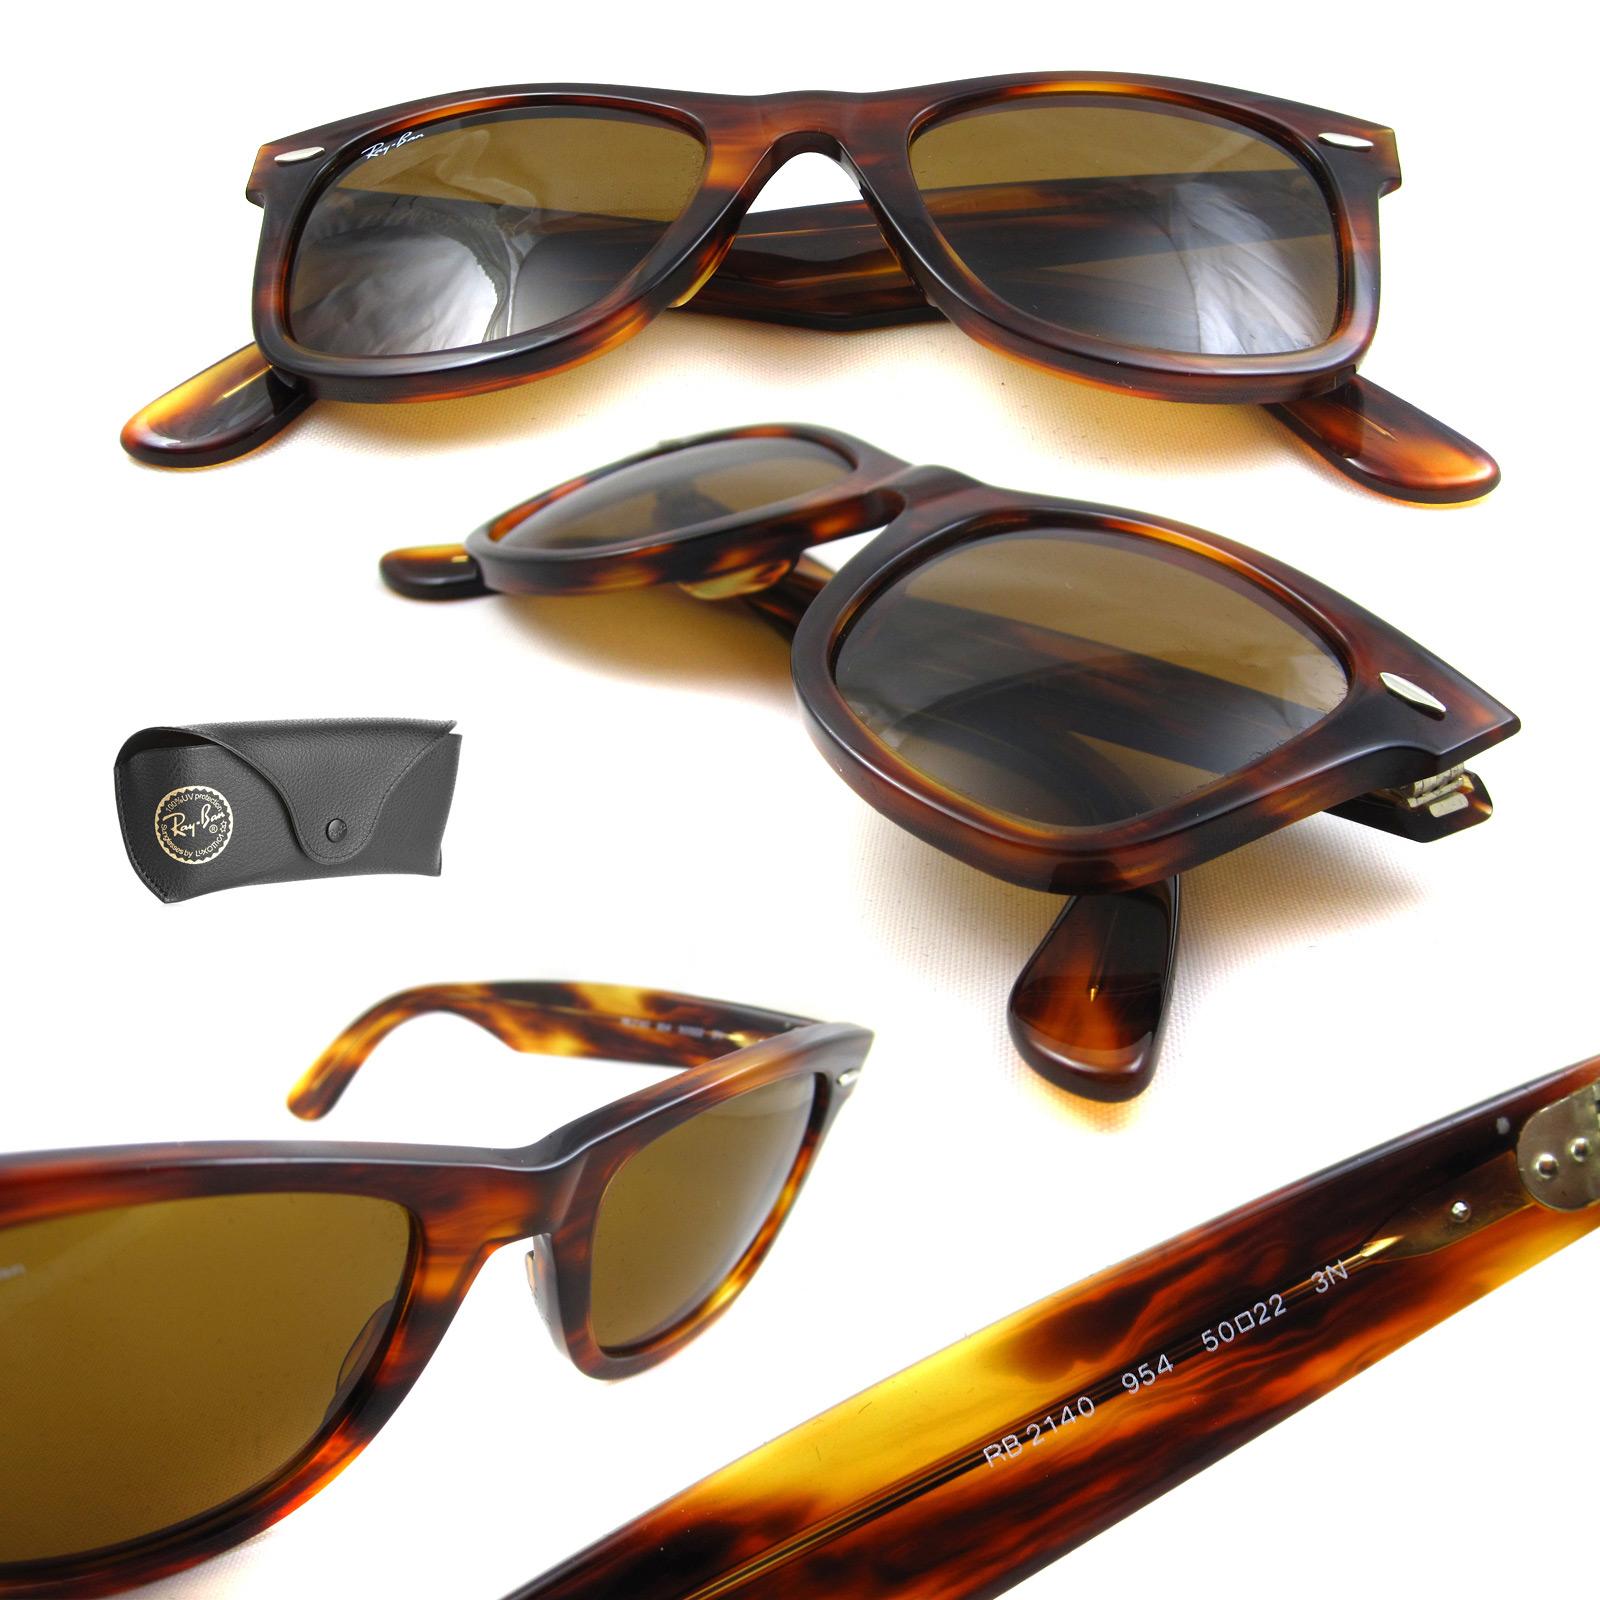 ray ban 2140 sale  Rayban Sunglasses Wayfarer 2140 954 Light Tortoise 50mm